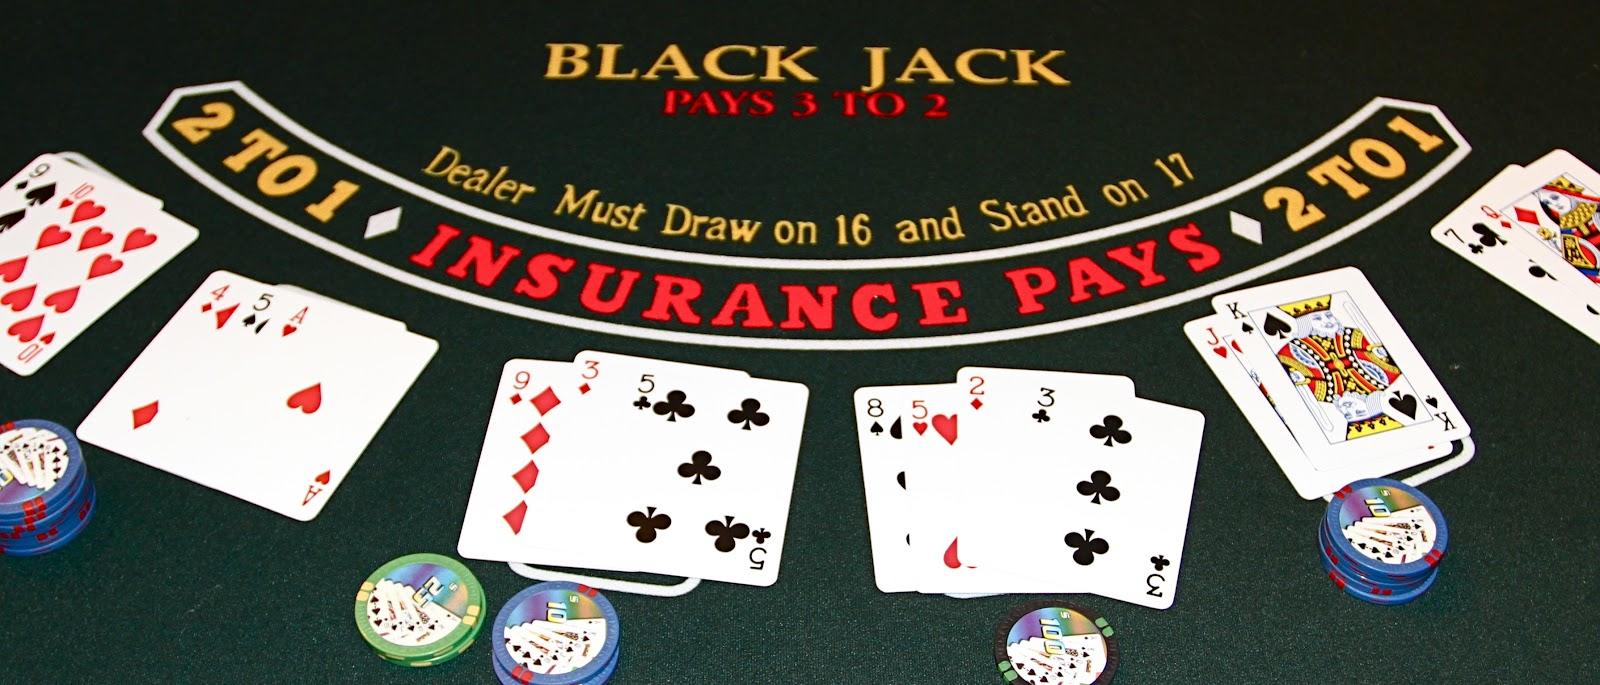 imagescasino-blackjack-4.jpg